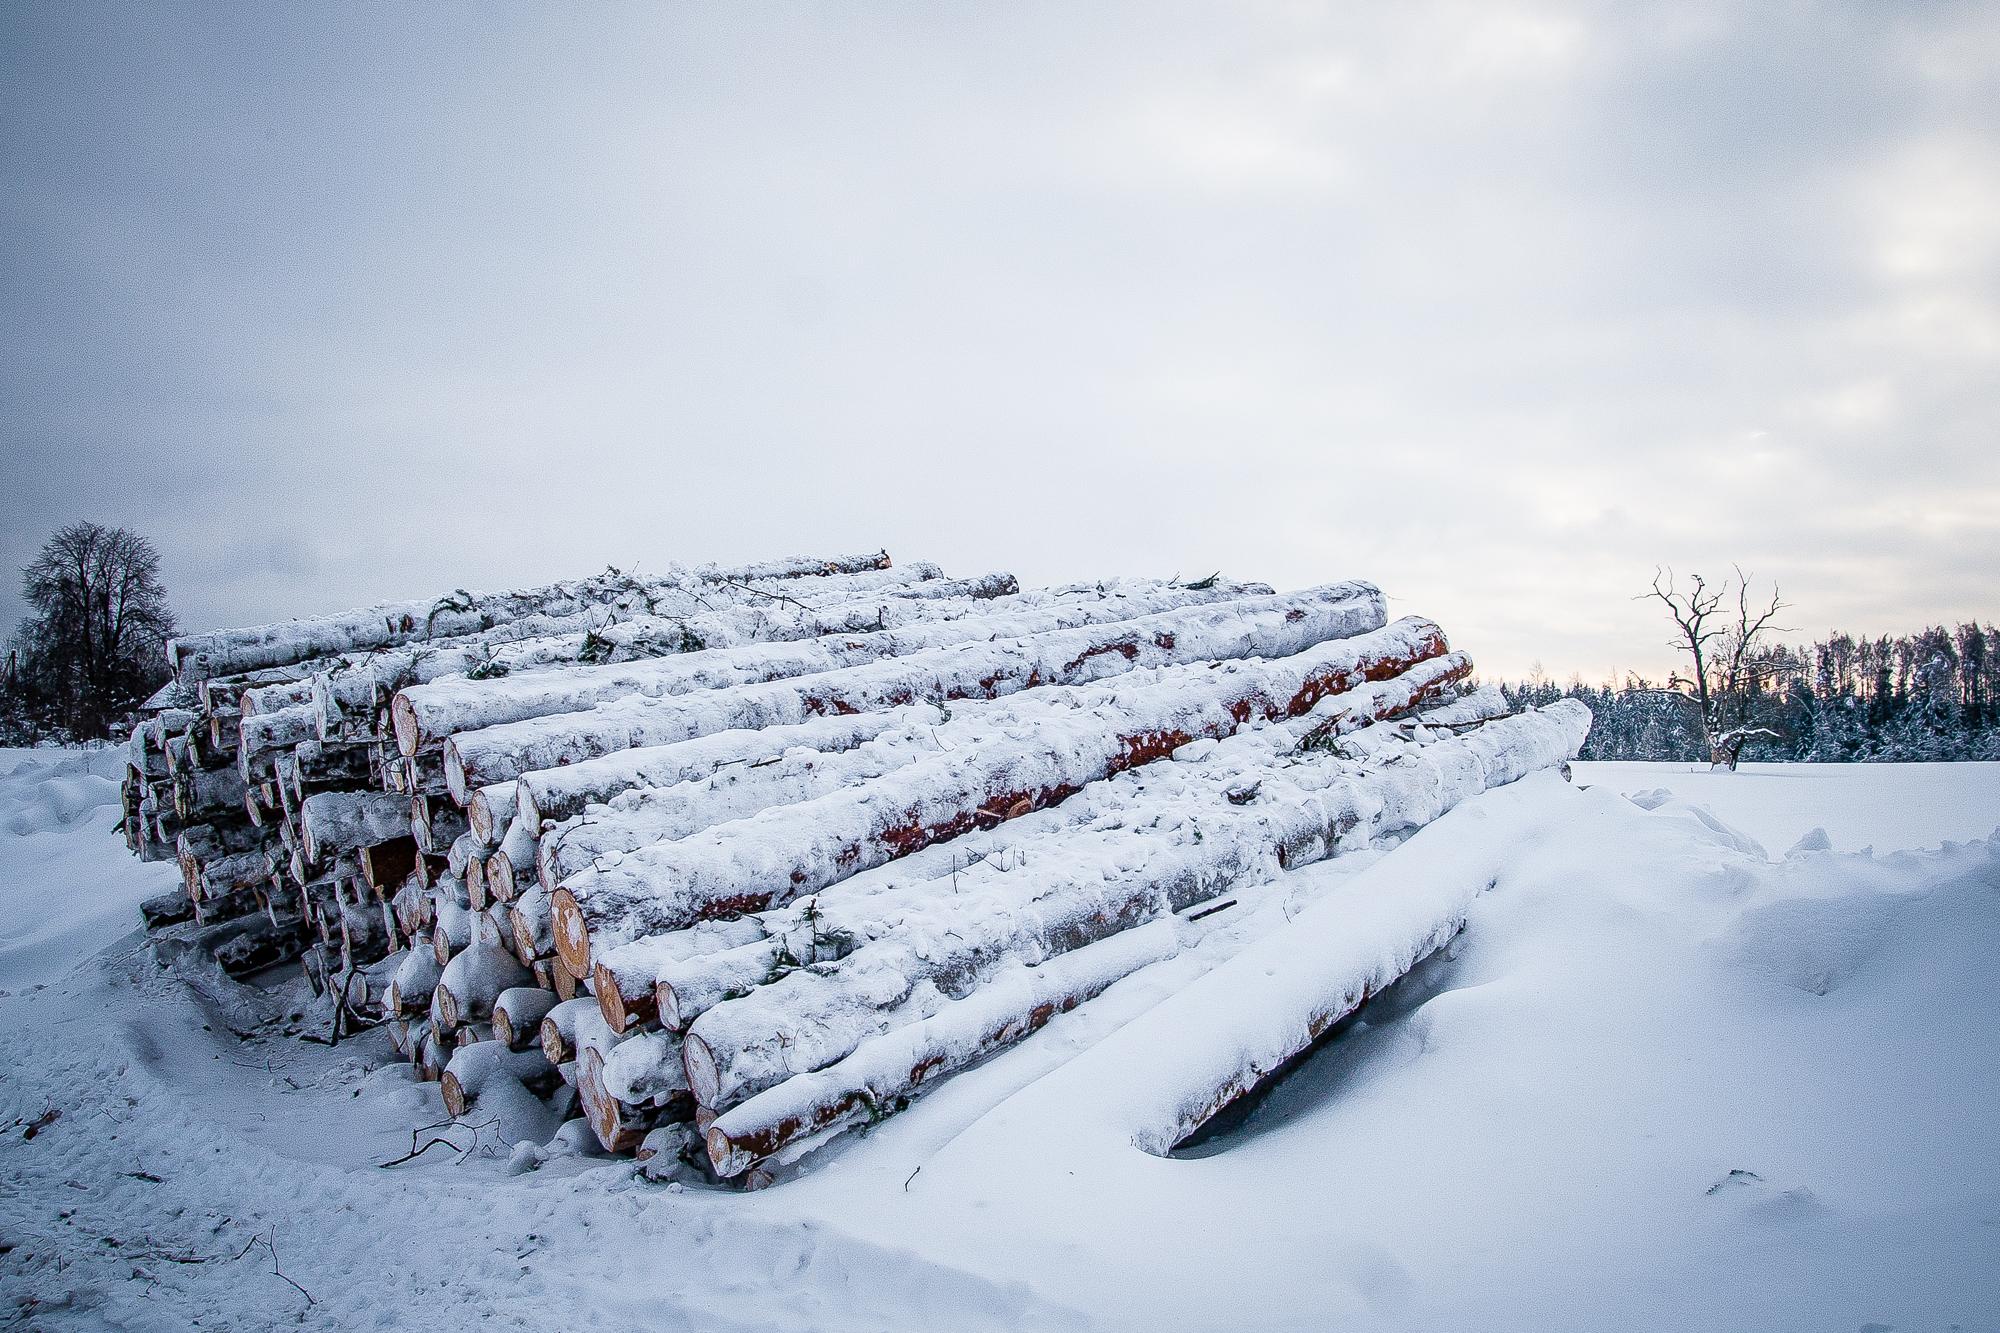 Timber Via @Atisgailis